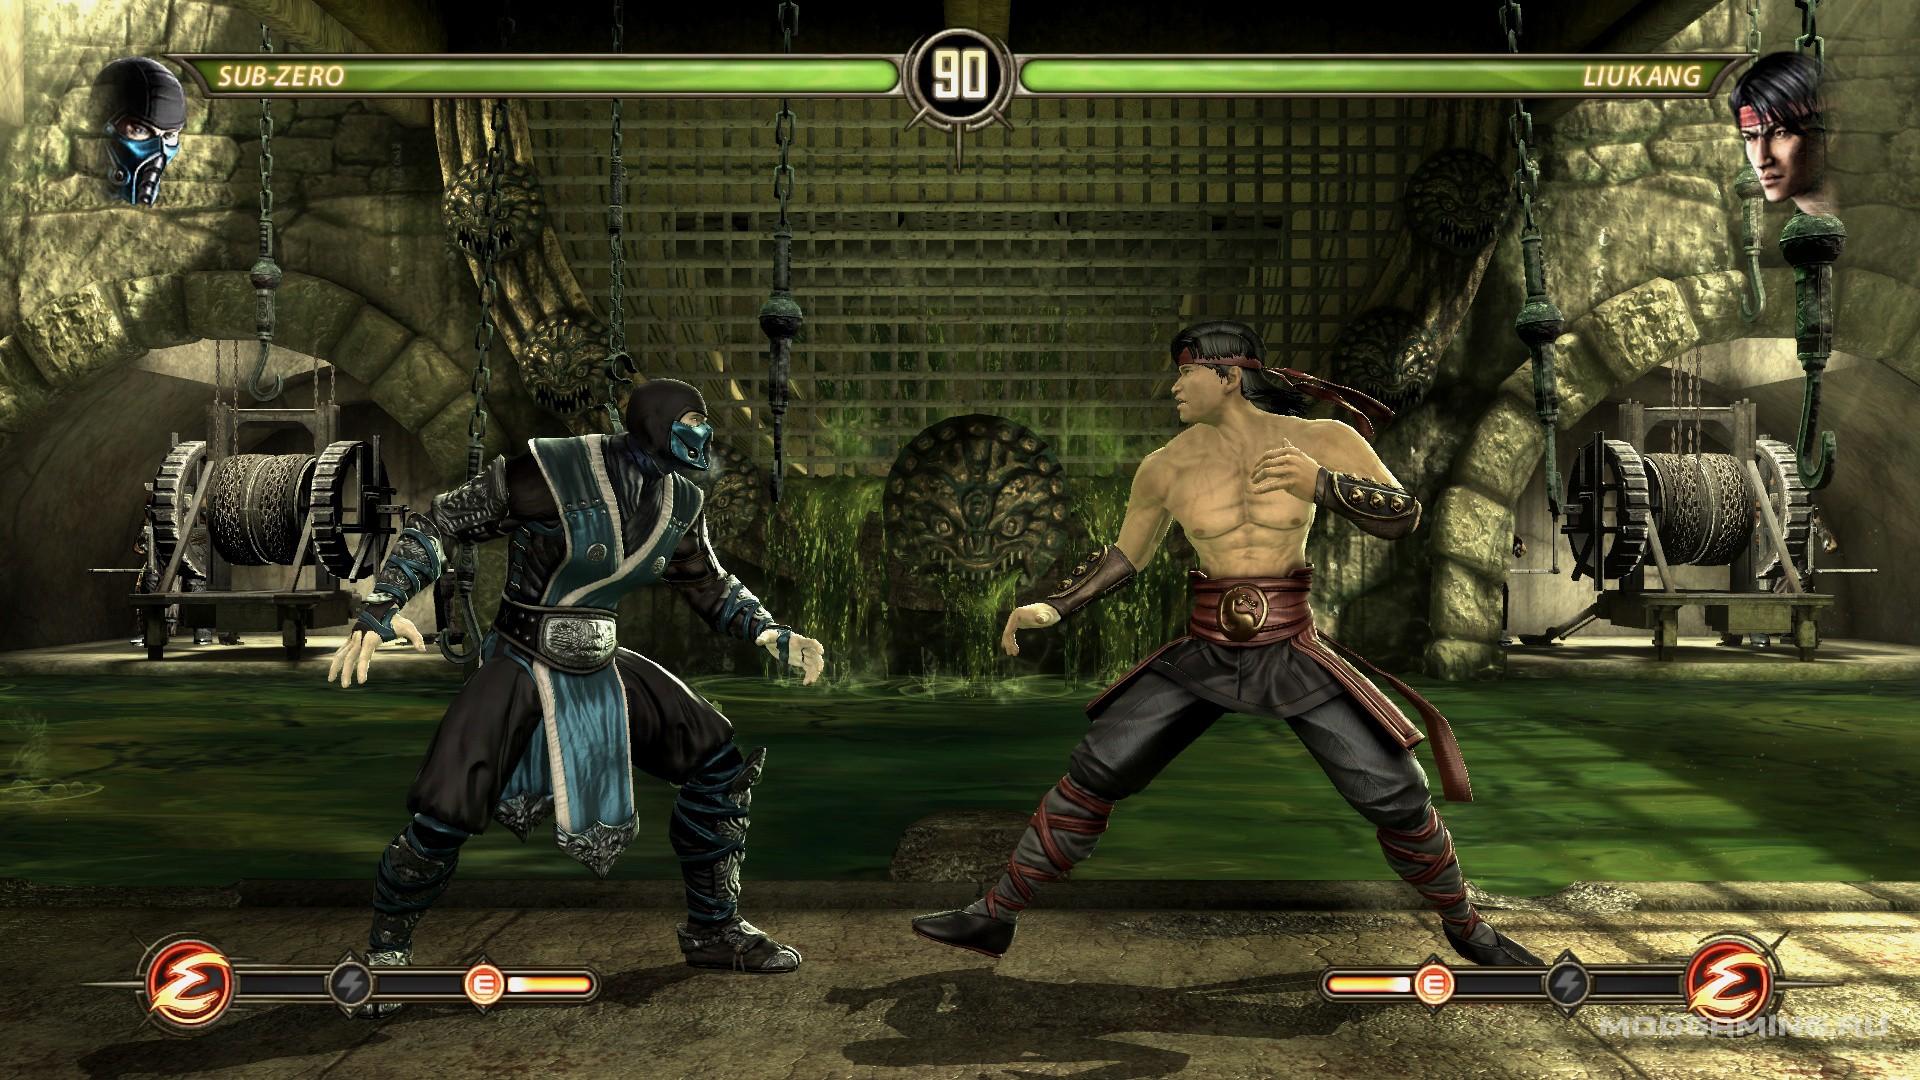 Серый костюм Кибер Саб-Зиро для Mortal Kombat Komplete Edition